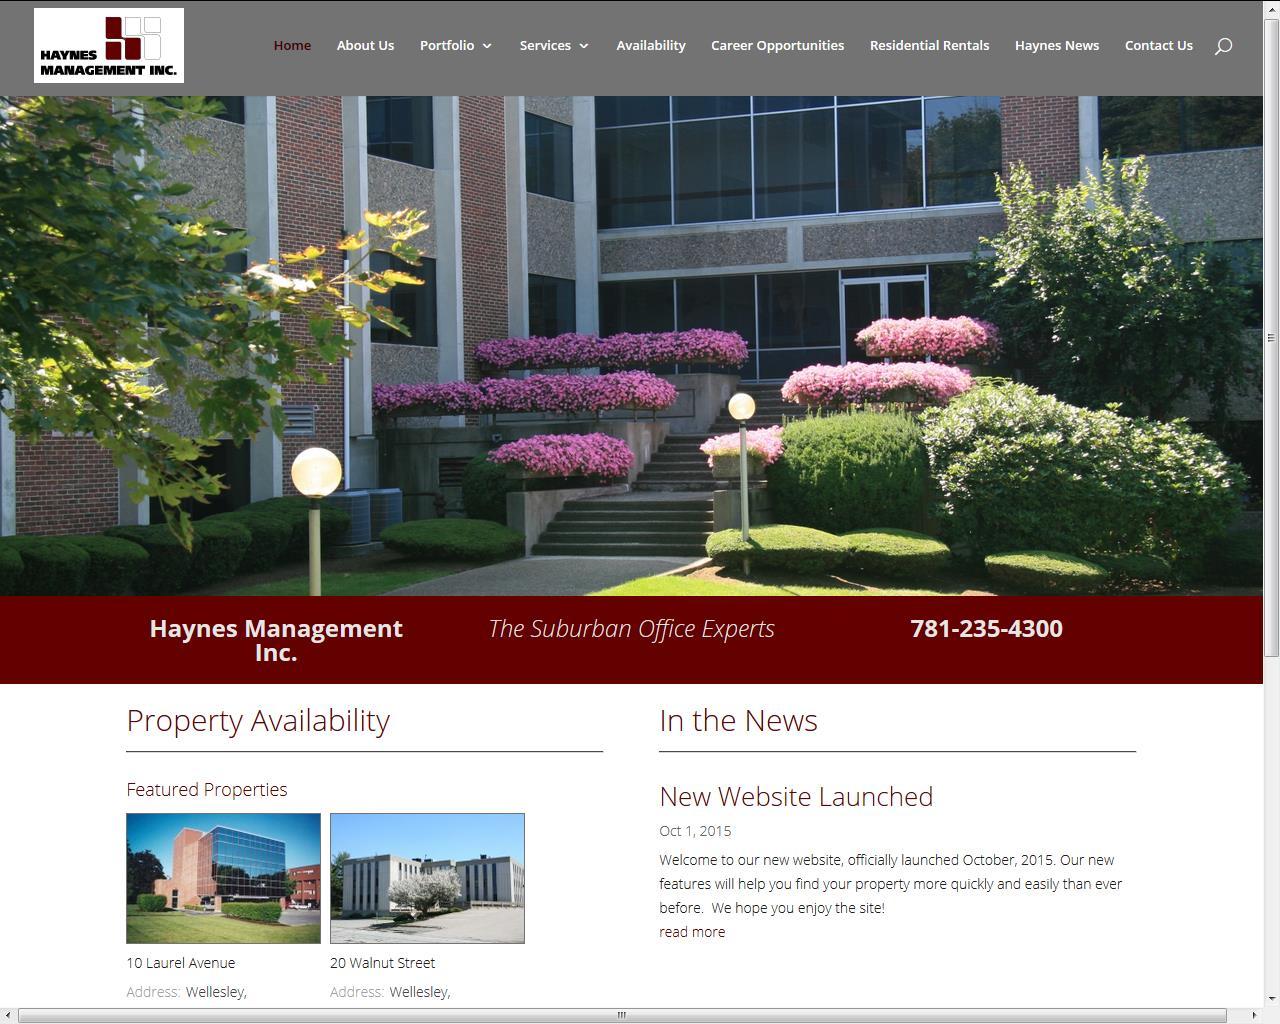 Haynes Management